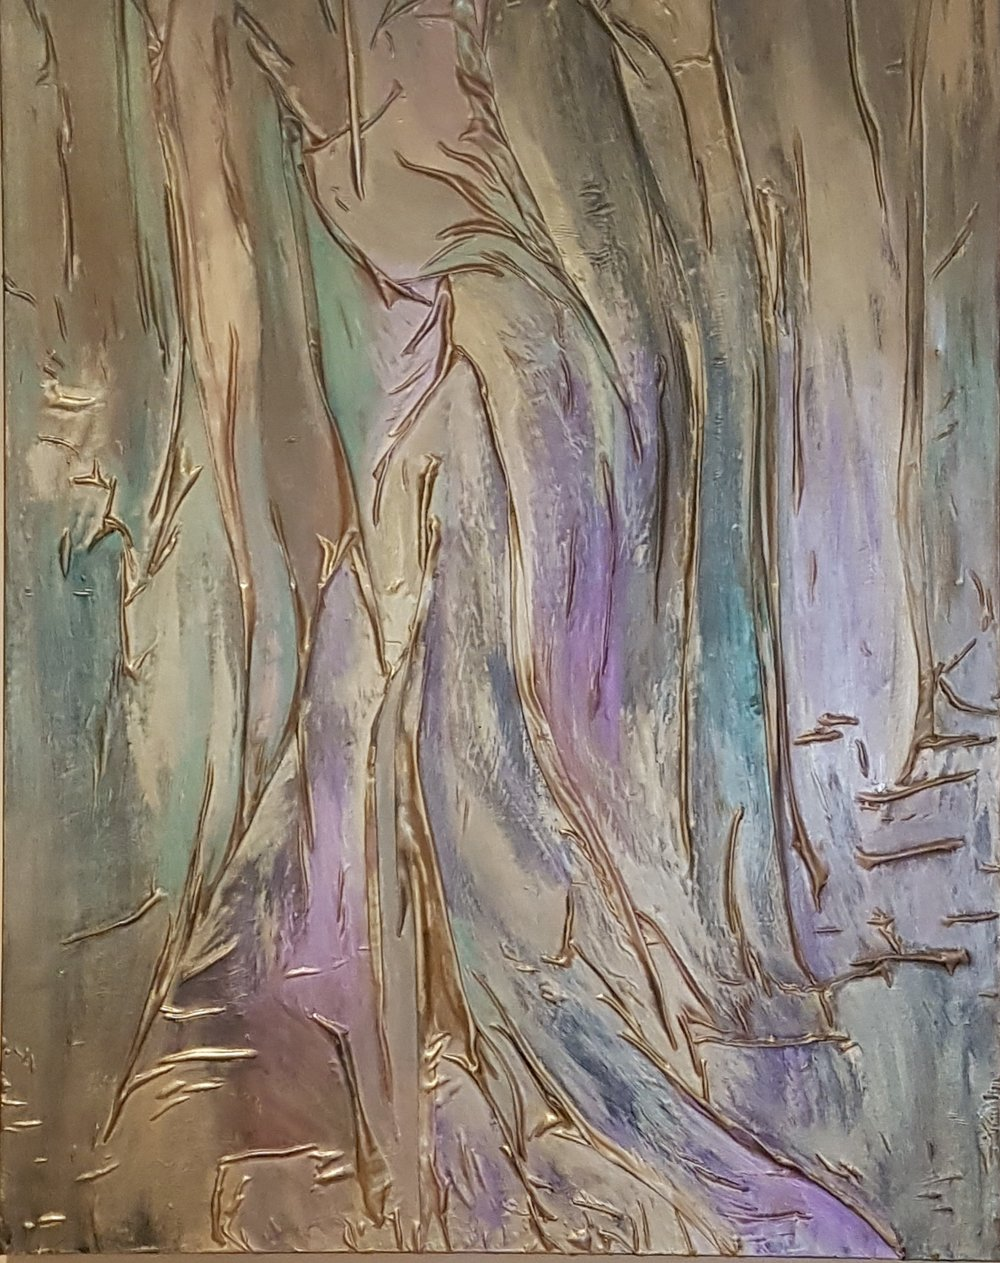 lynn wilson - Silk Cloaked Lady Purple Emereld Gold .jpg